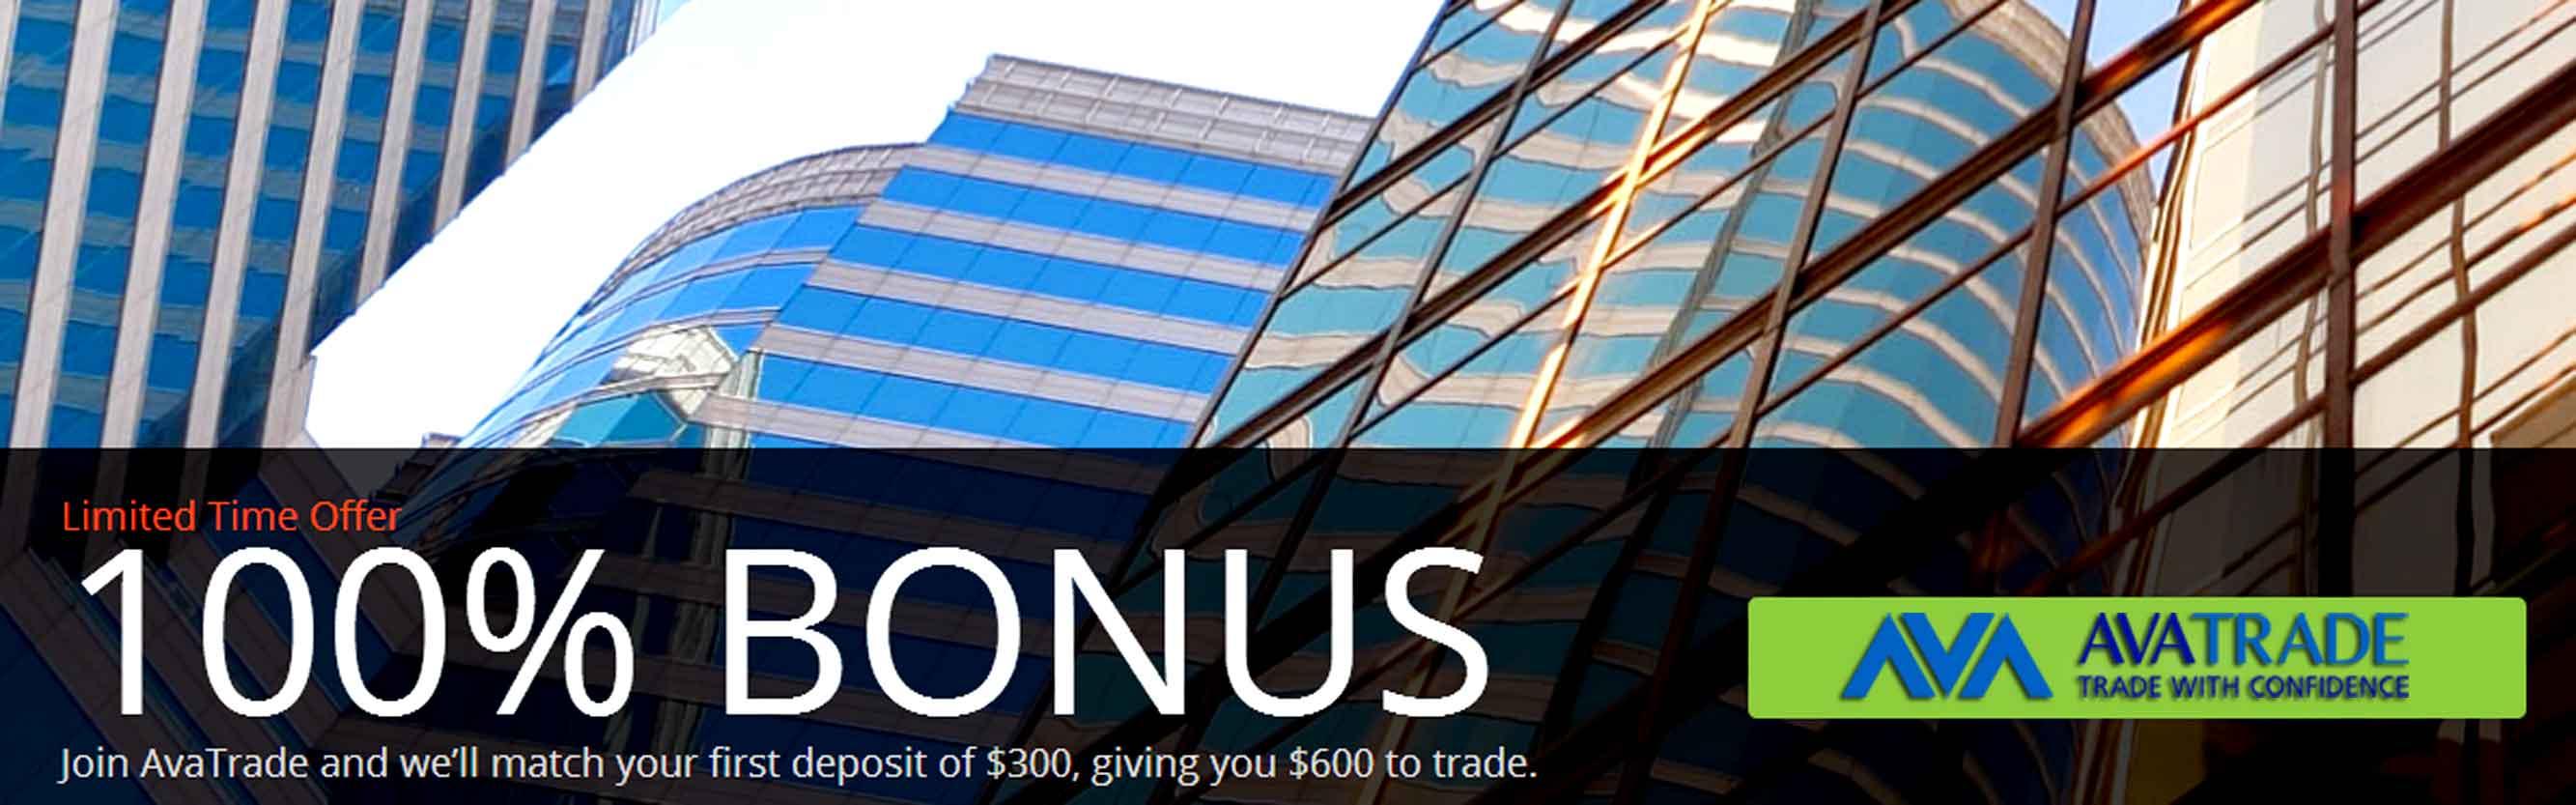 avatrade deposit bonus